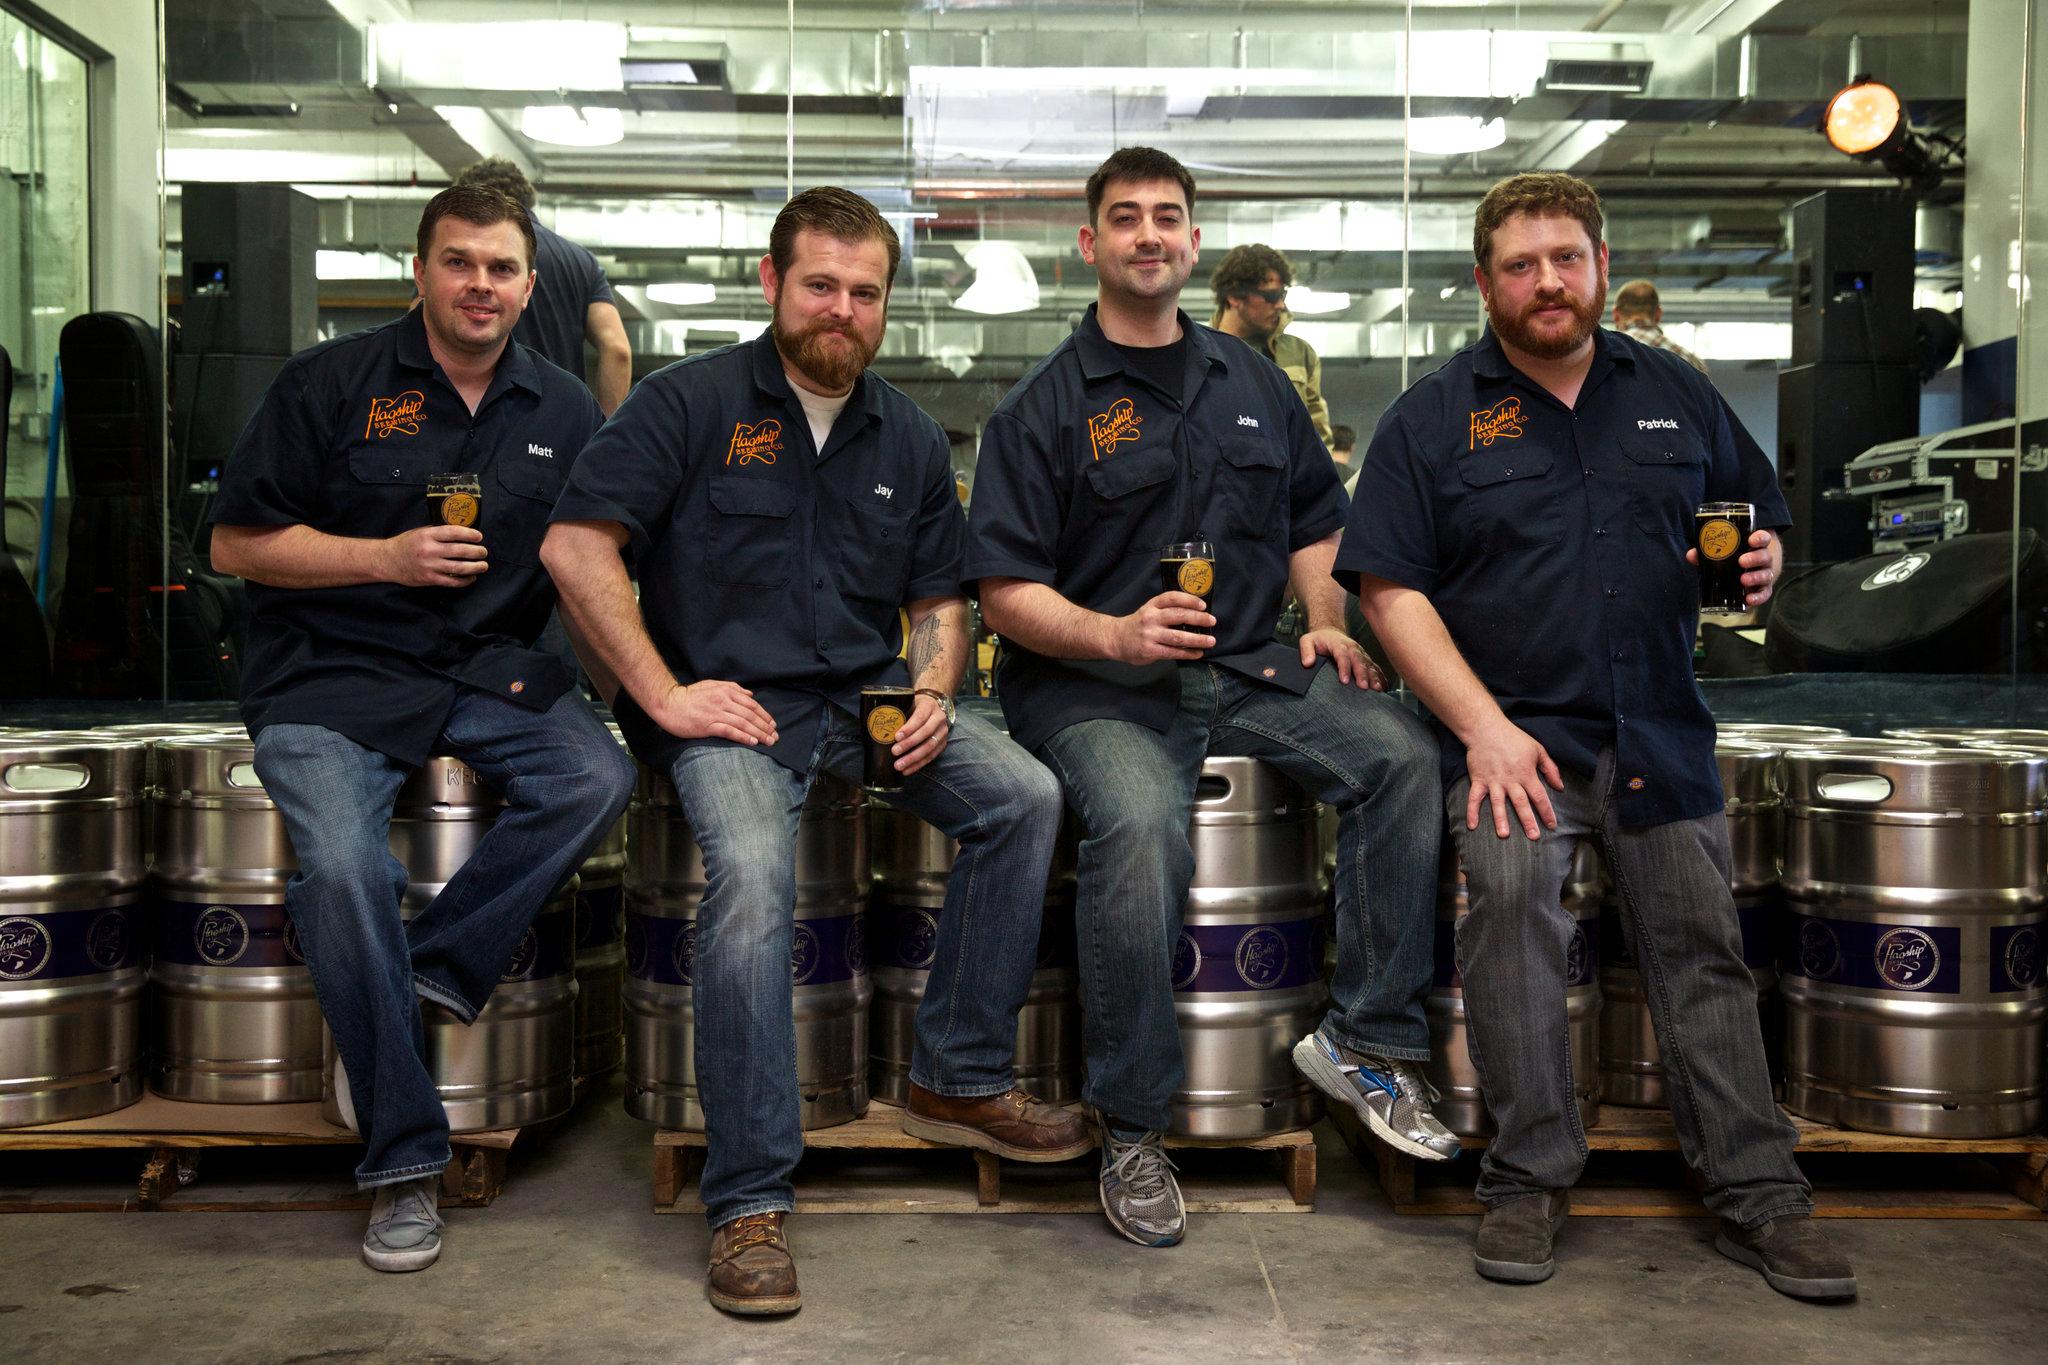 From left to right -  Matthew McGinley  - EVP Sales,  Jay Sykes  - COO/EVP,  John Gordon  - CEO/President,  Patrick Morse  - Head Brewer